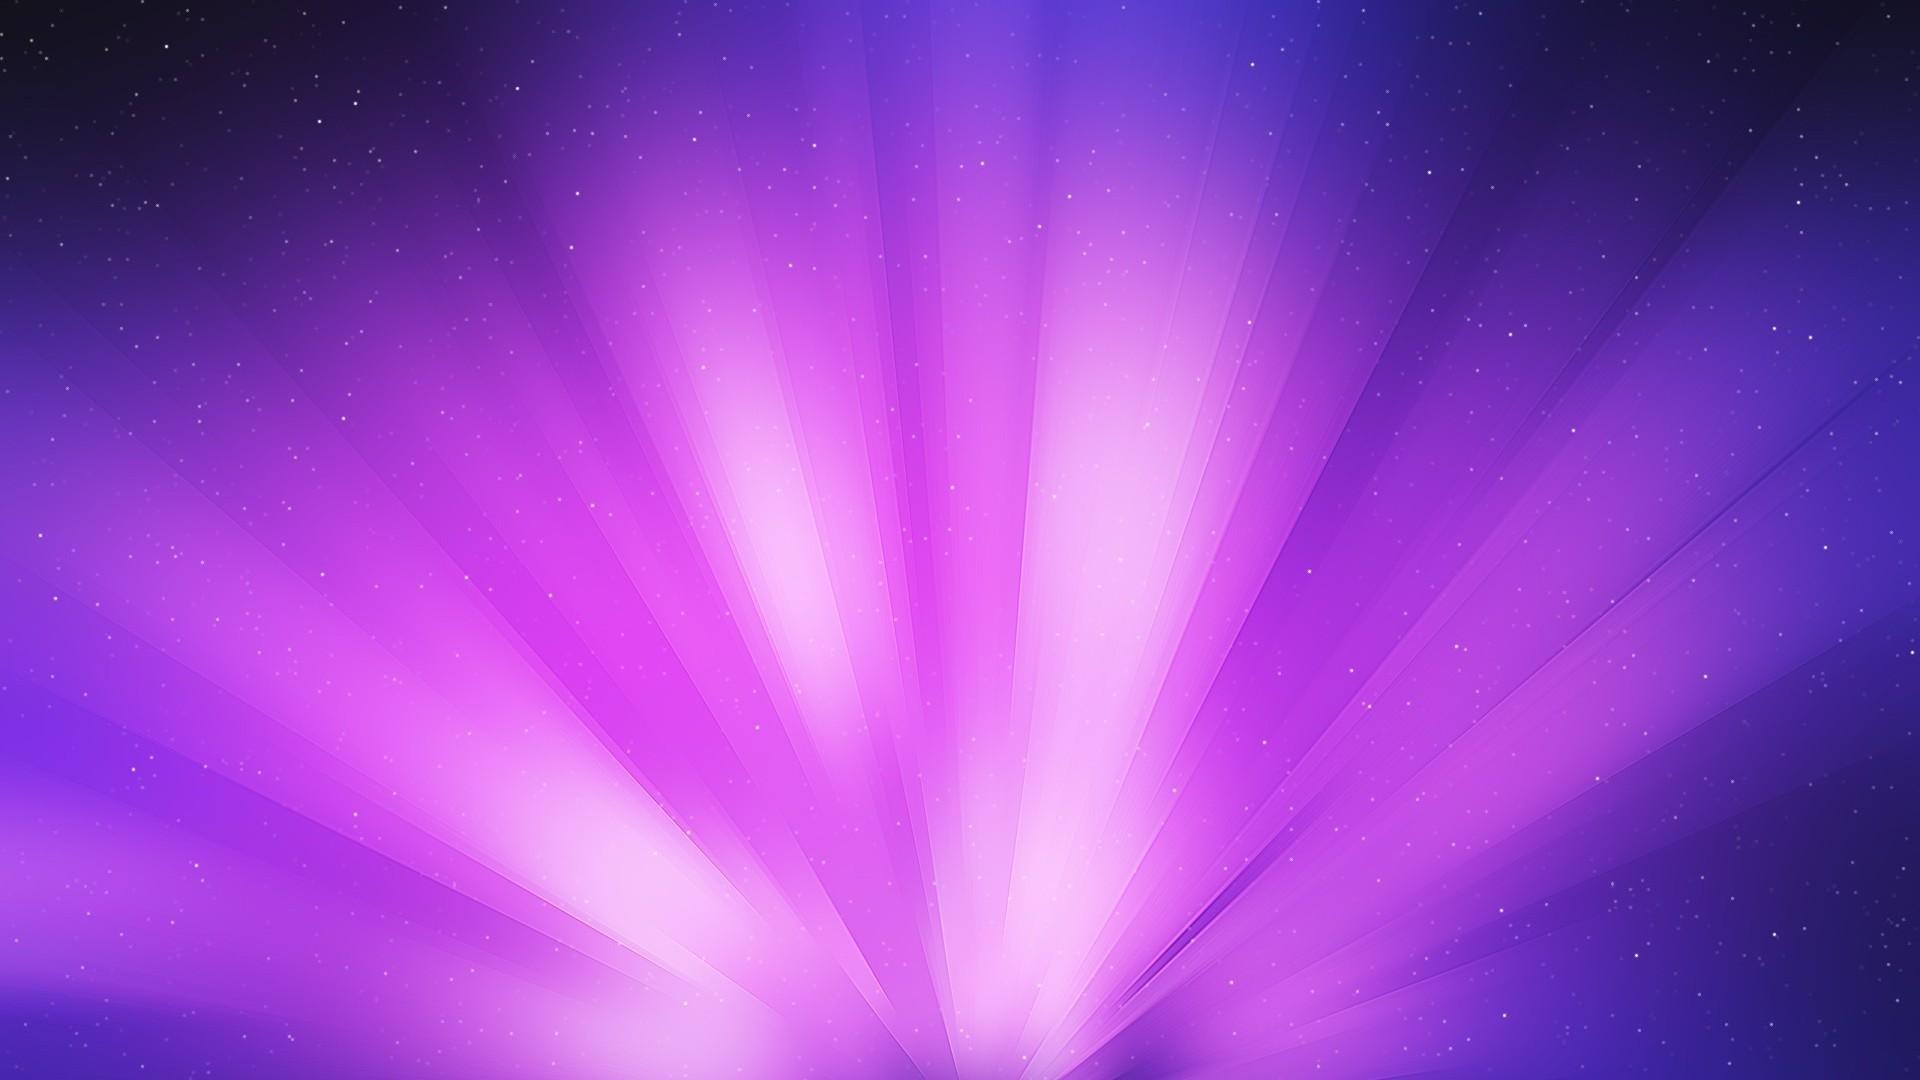 Animated 3d Wallpaper Gifs Looping Purple Beam Wallpaper Hd Wallpapers